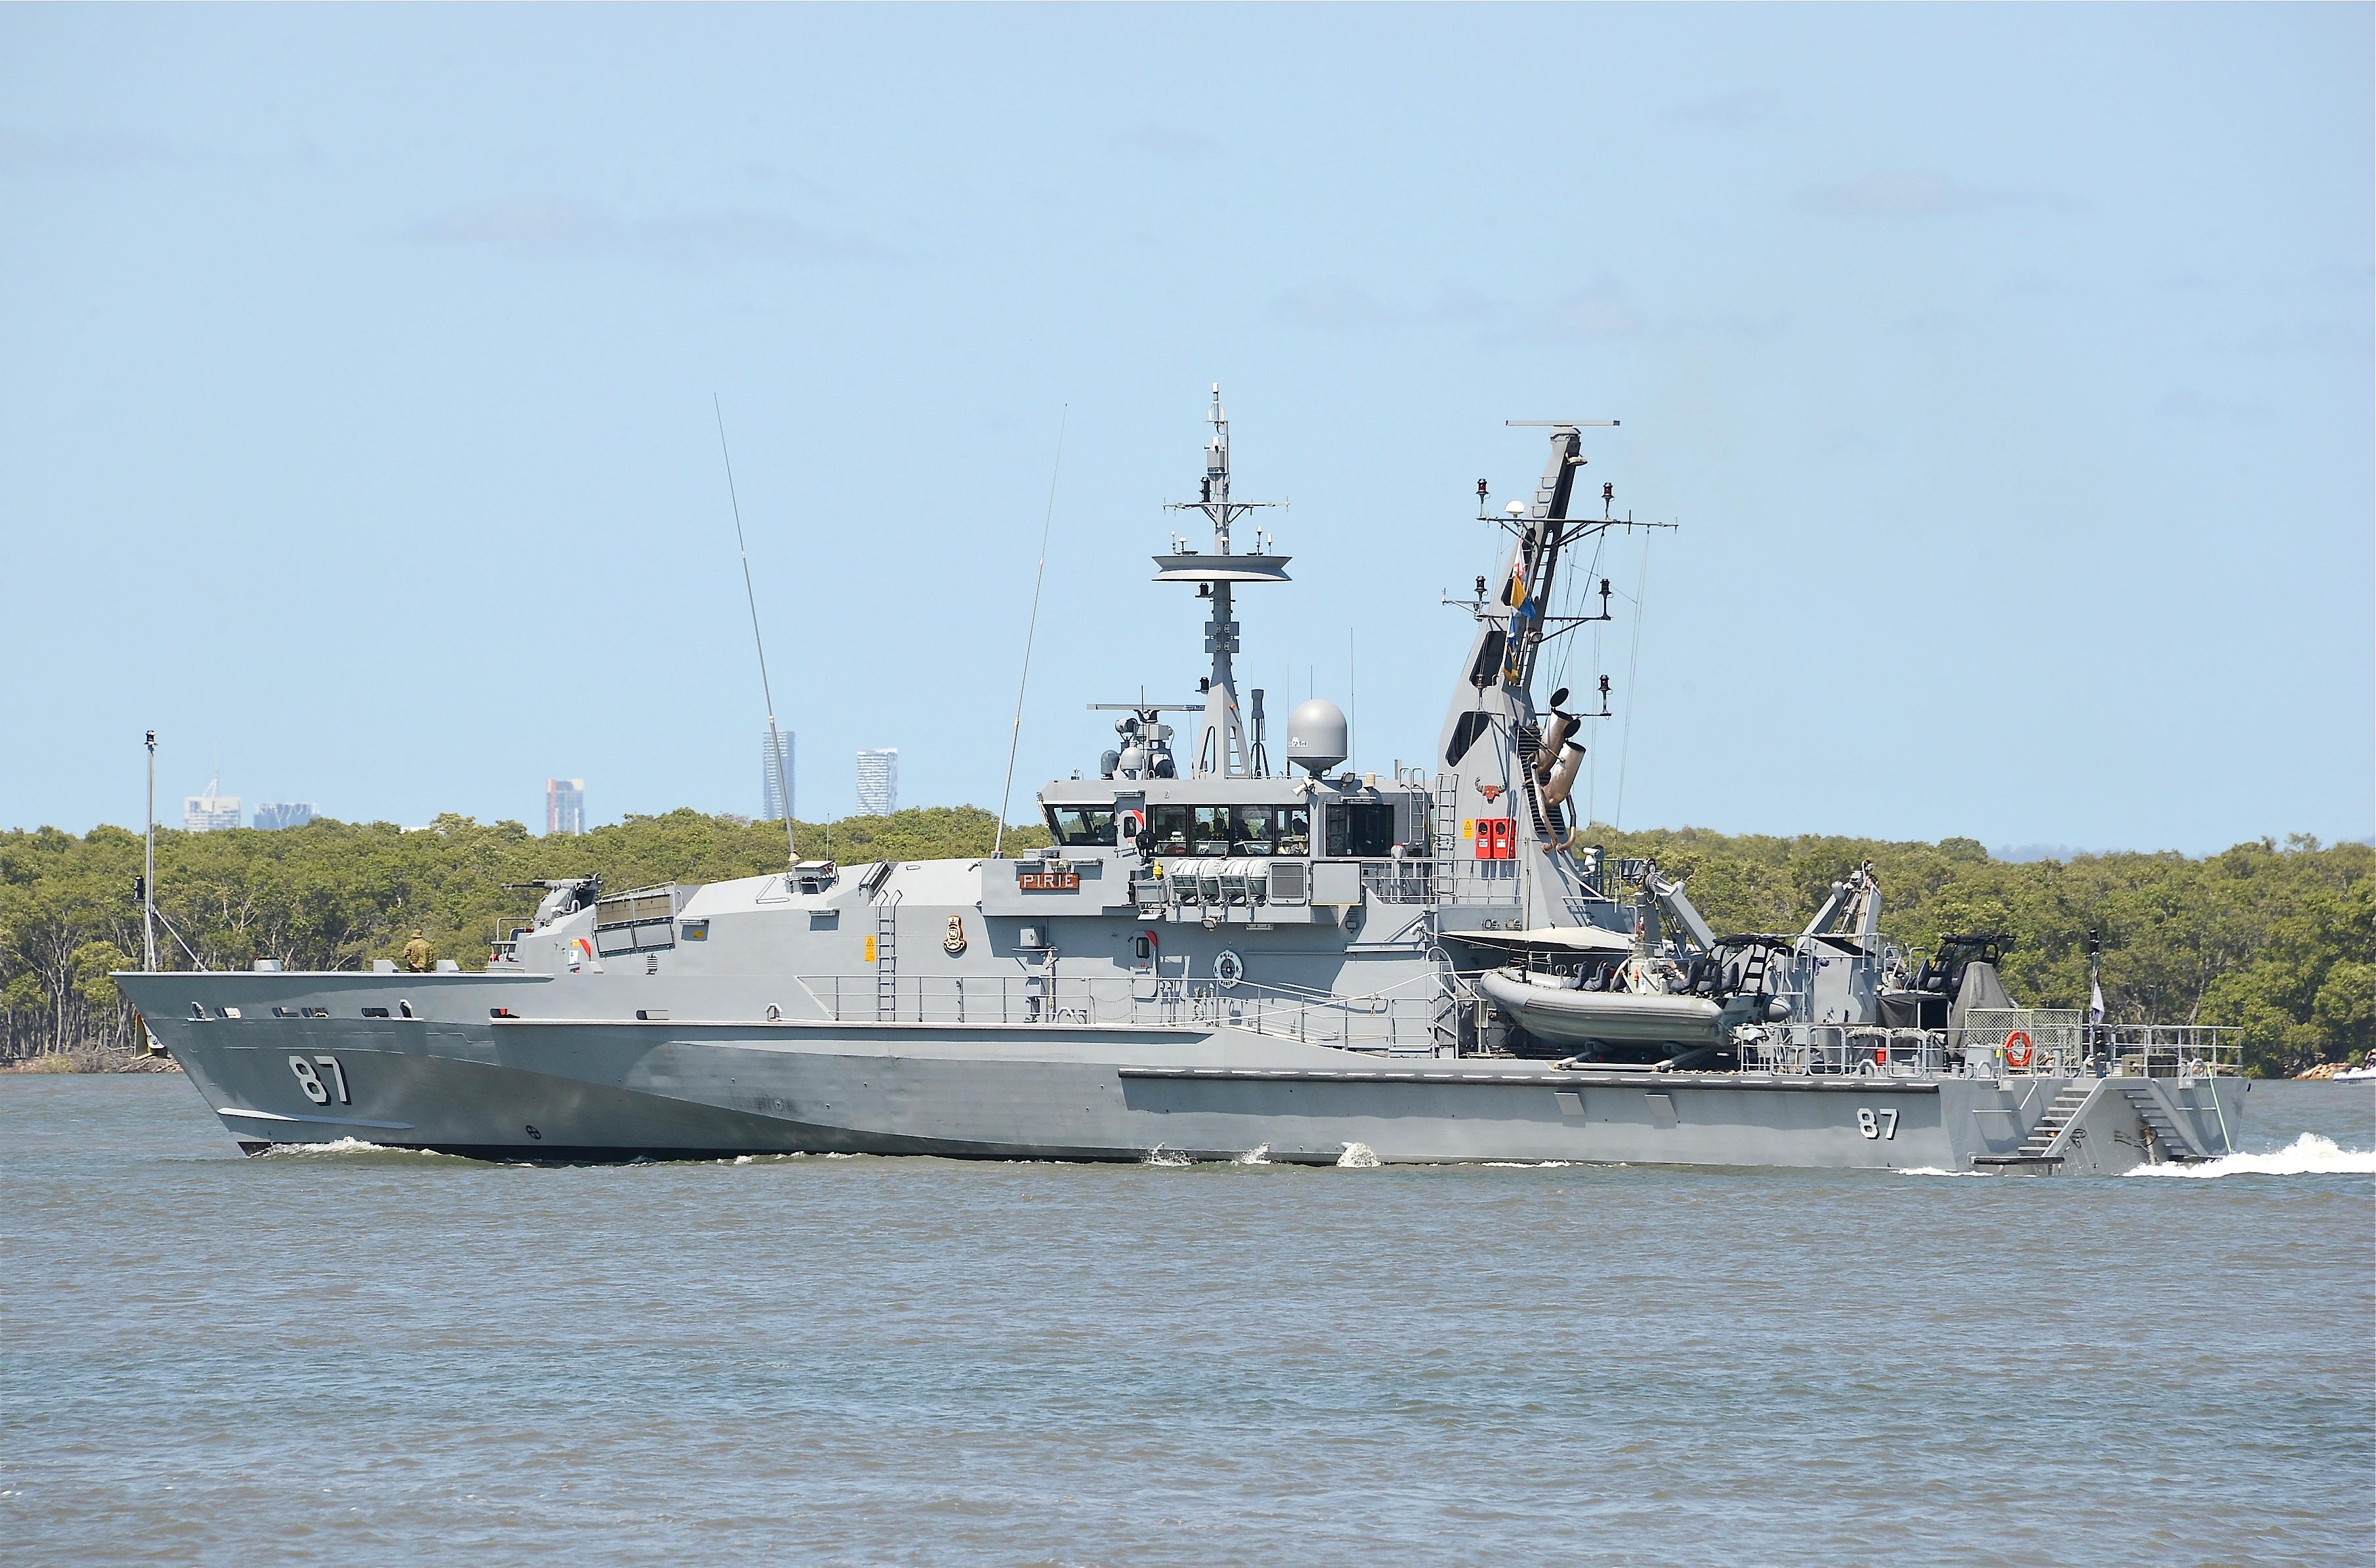 Australian Navy - Marine Australienne - Page 4 2592627